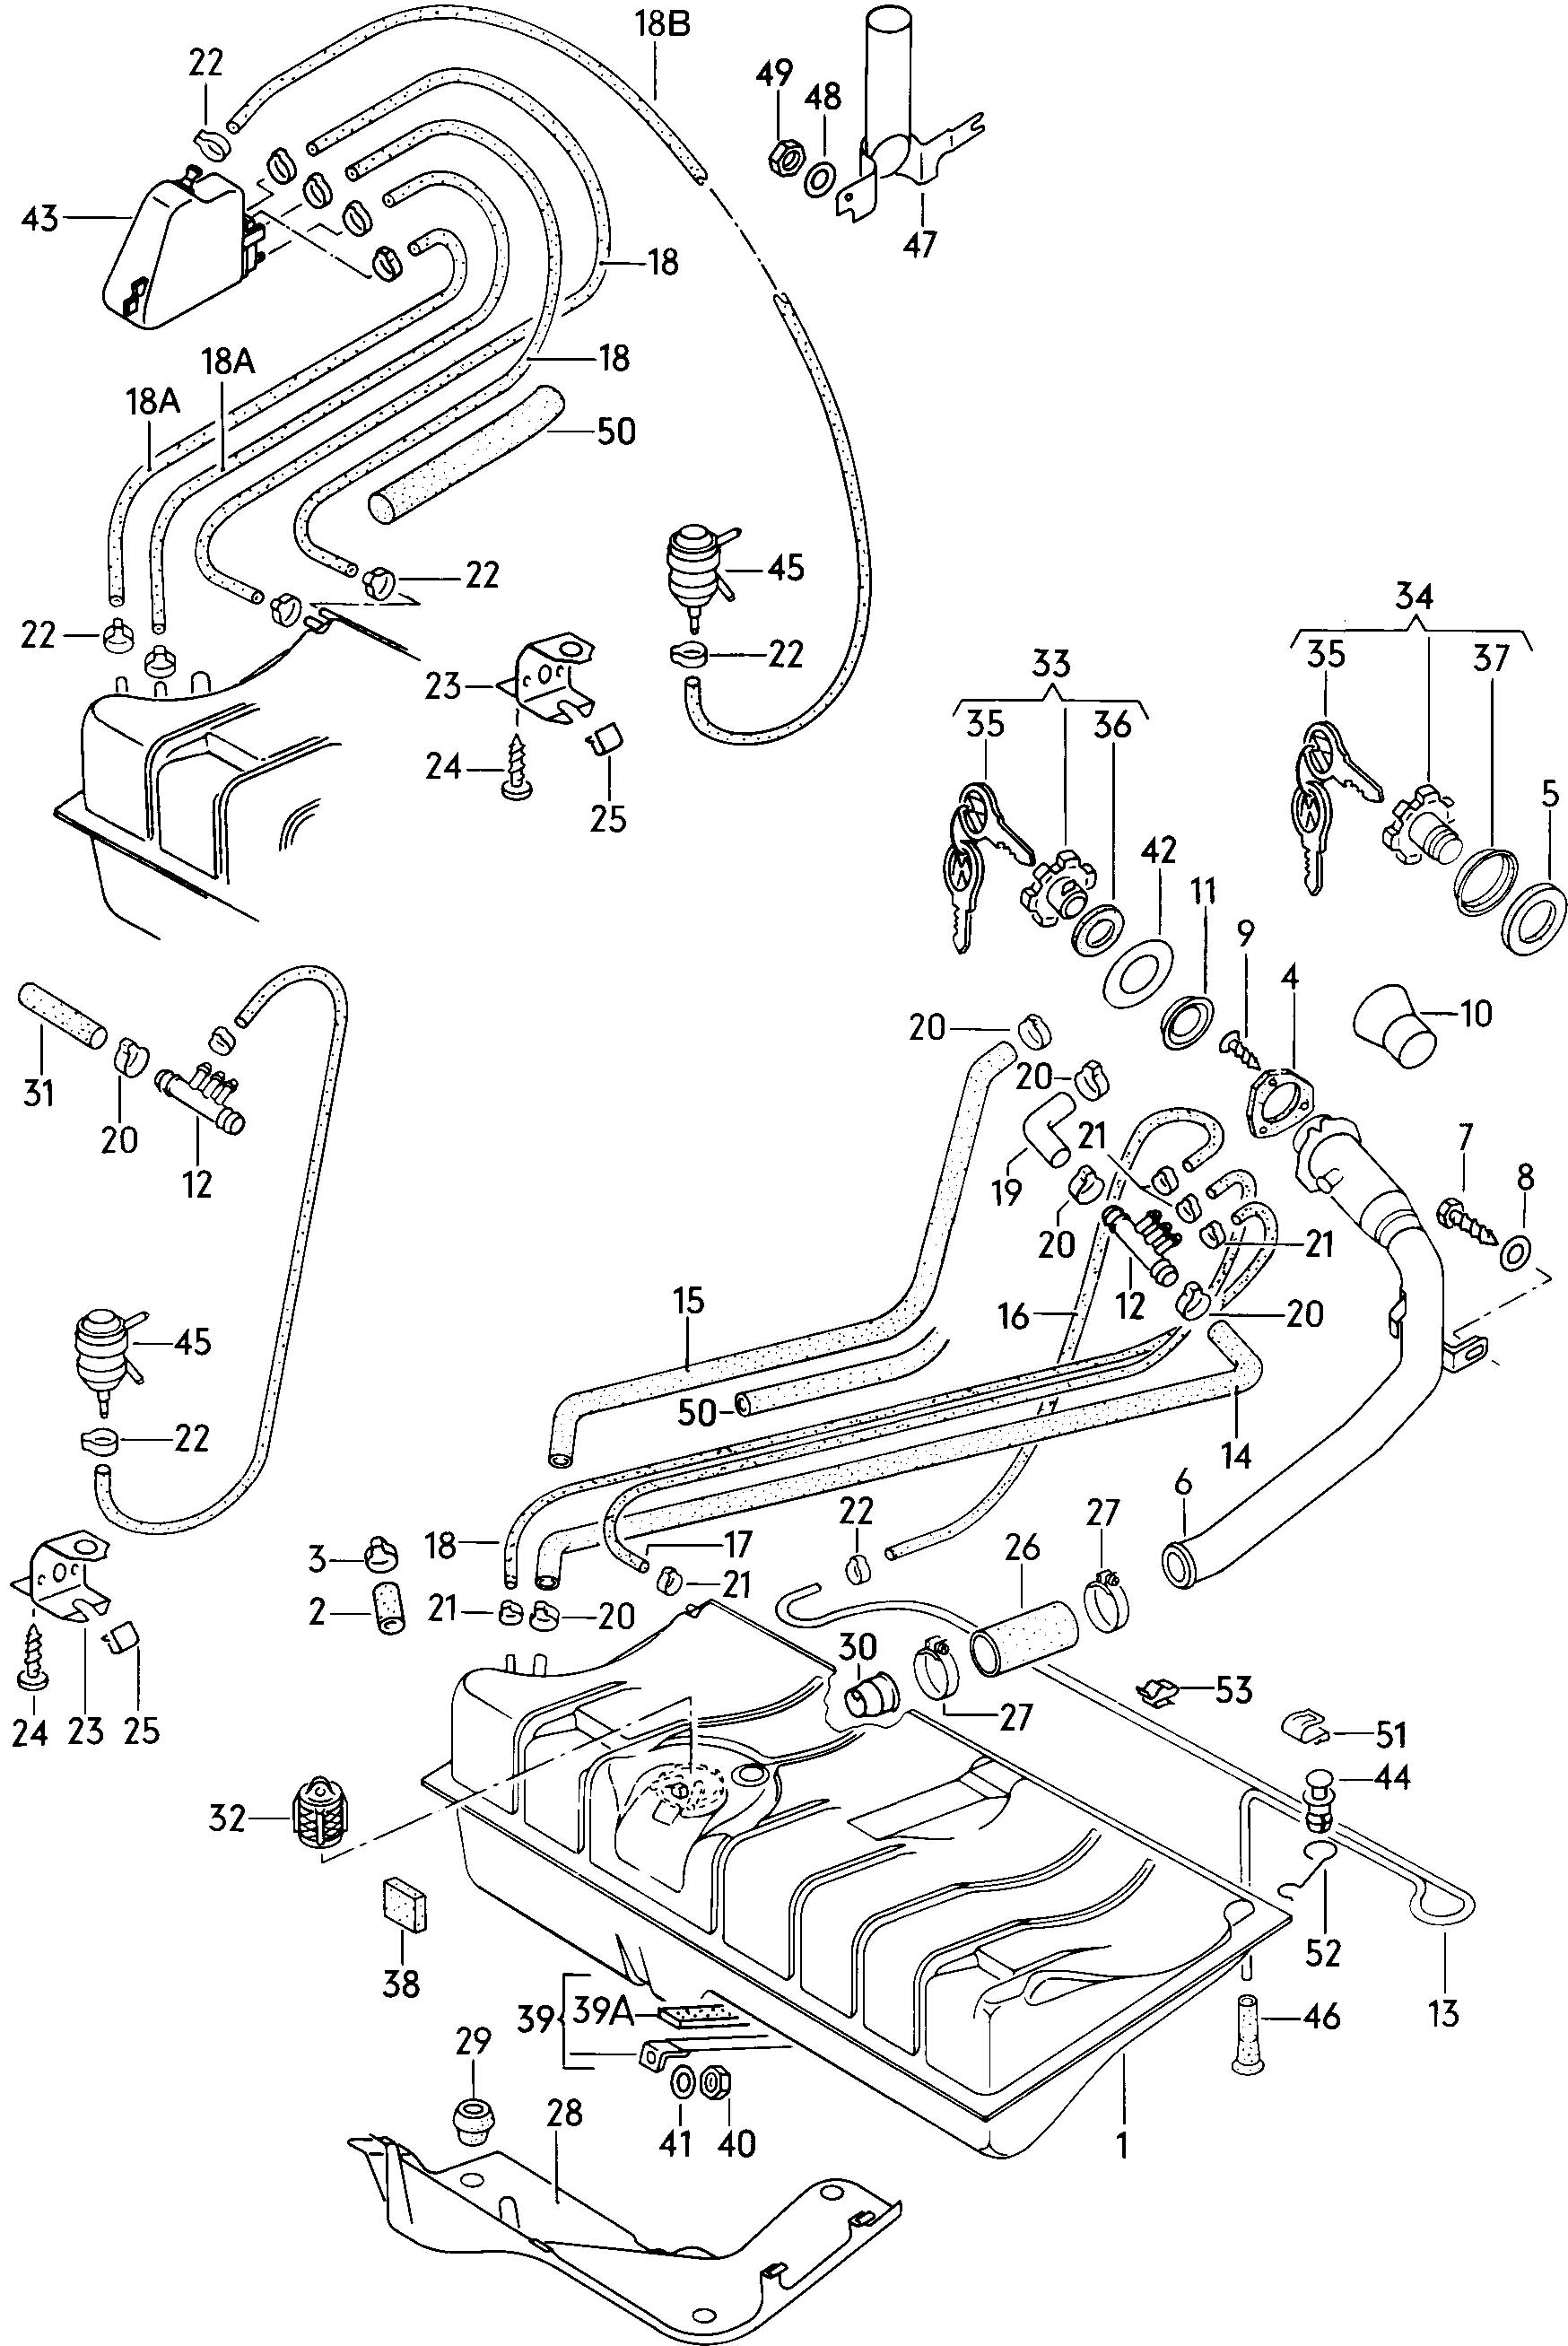 Volkswagen Rabbit Fuel Tank Gravity Valve Vent Tube